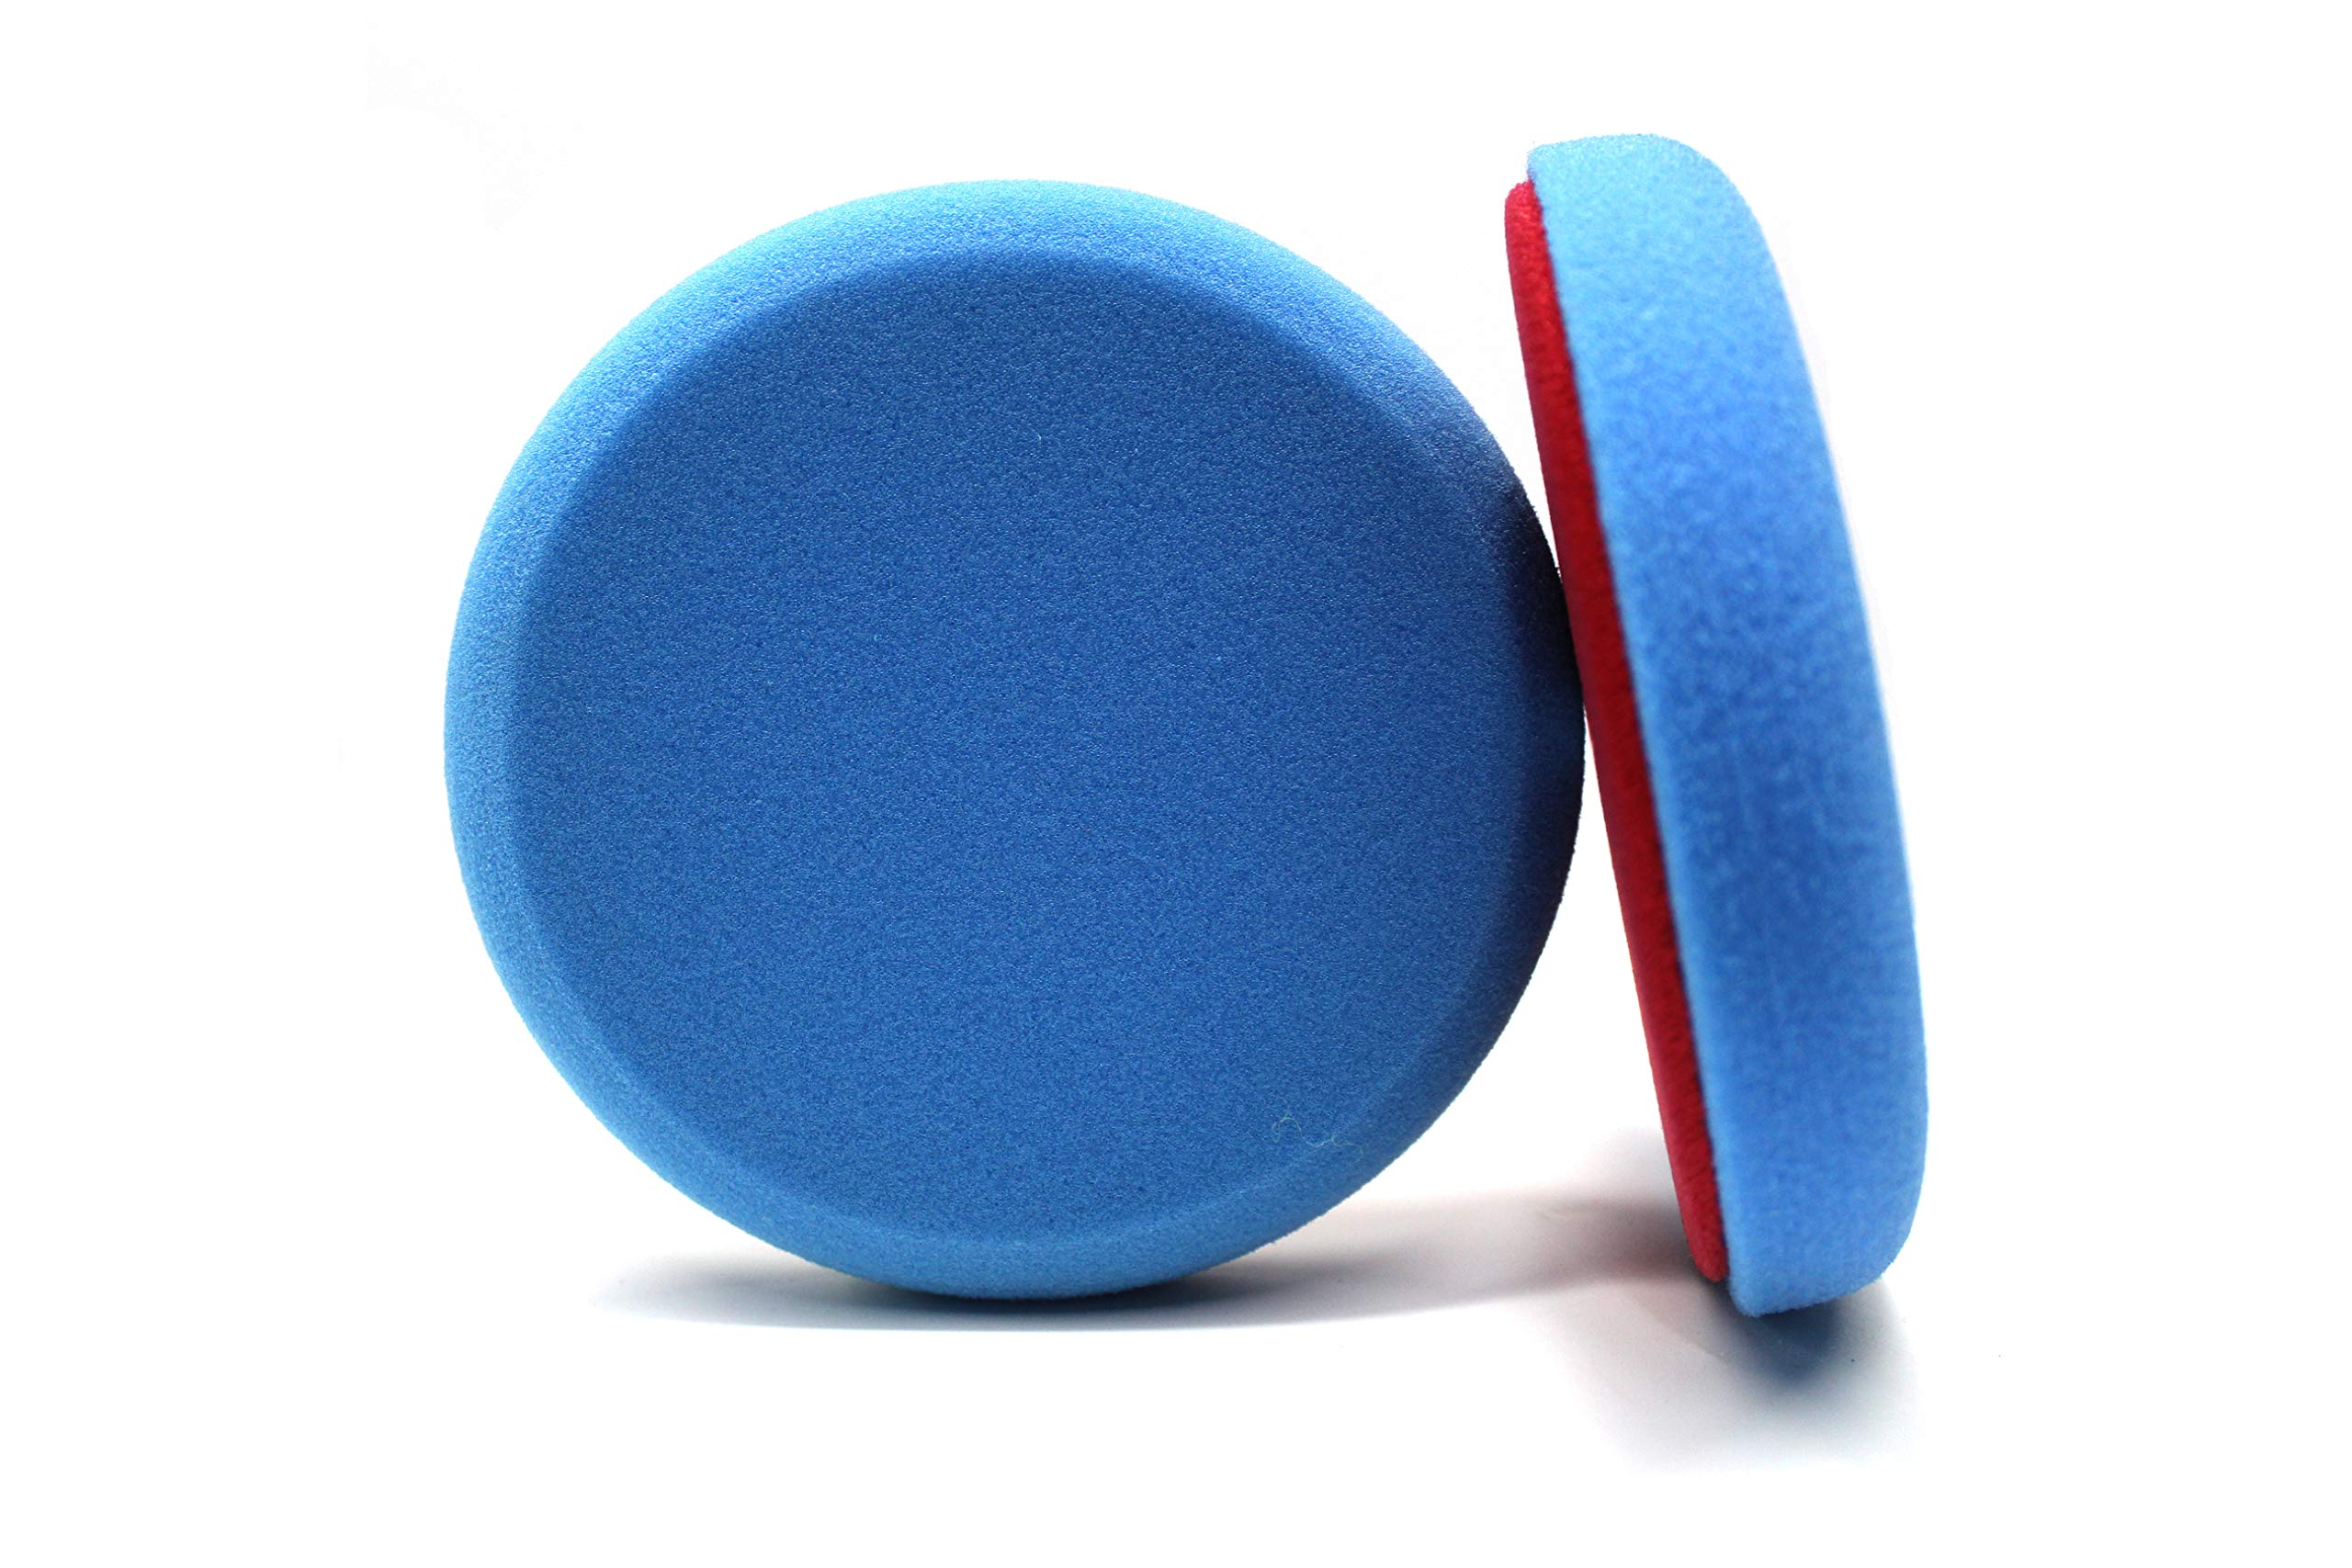 Maxshine Blue Flat Foam Finishing Pad - 5 Inch/130mm